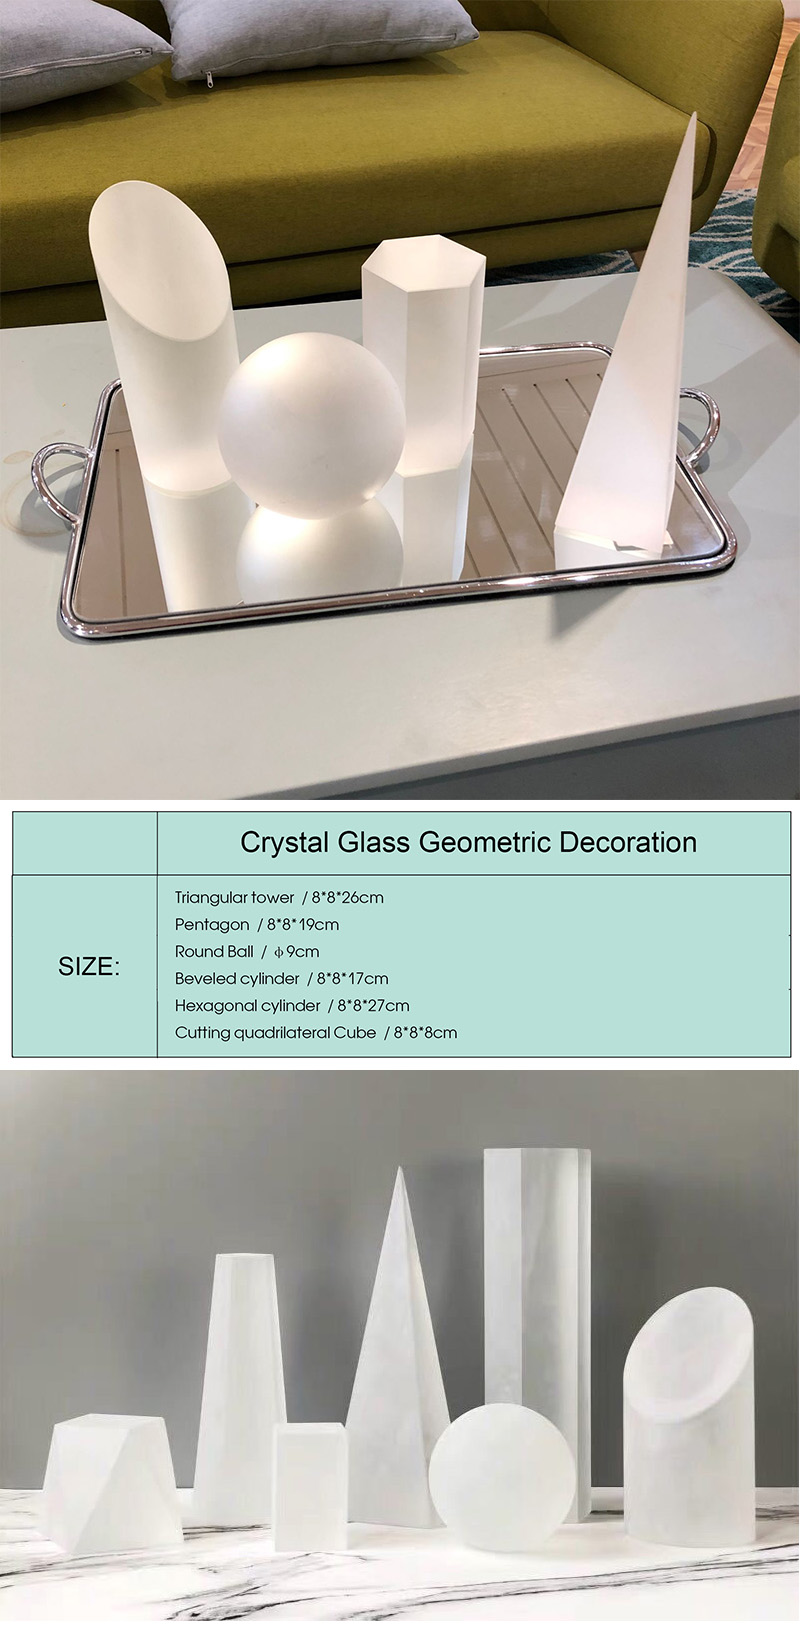 K9 crystal crafts obsidian crystal Ball pyramid Beveled cylinder Pillar Geometric ornaments for Weeding gift